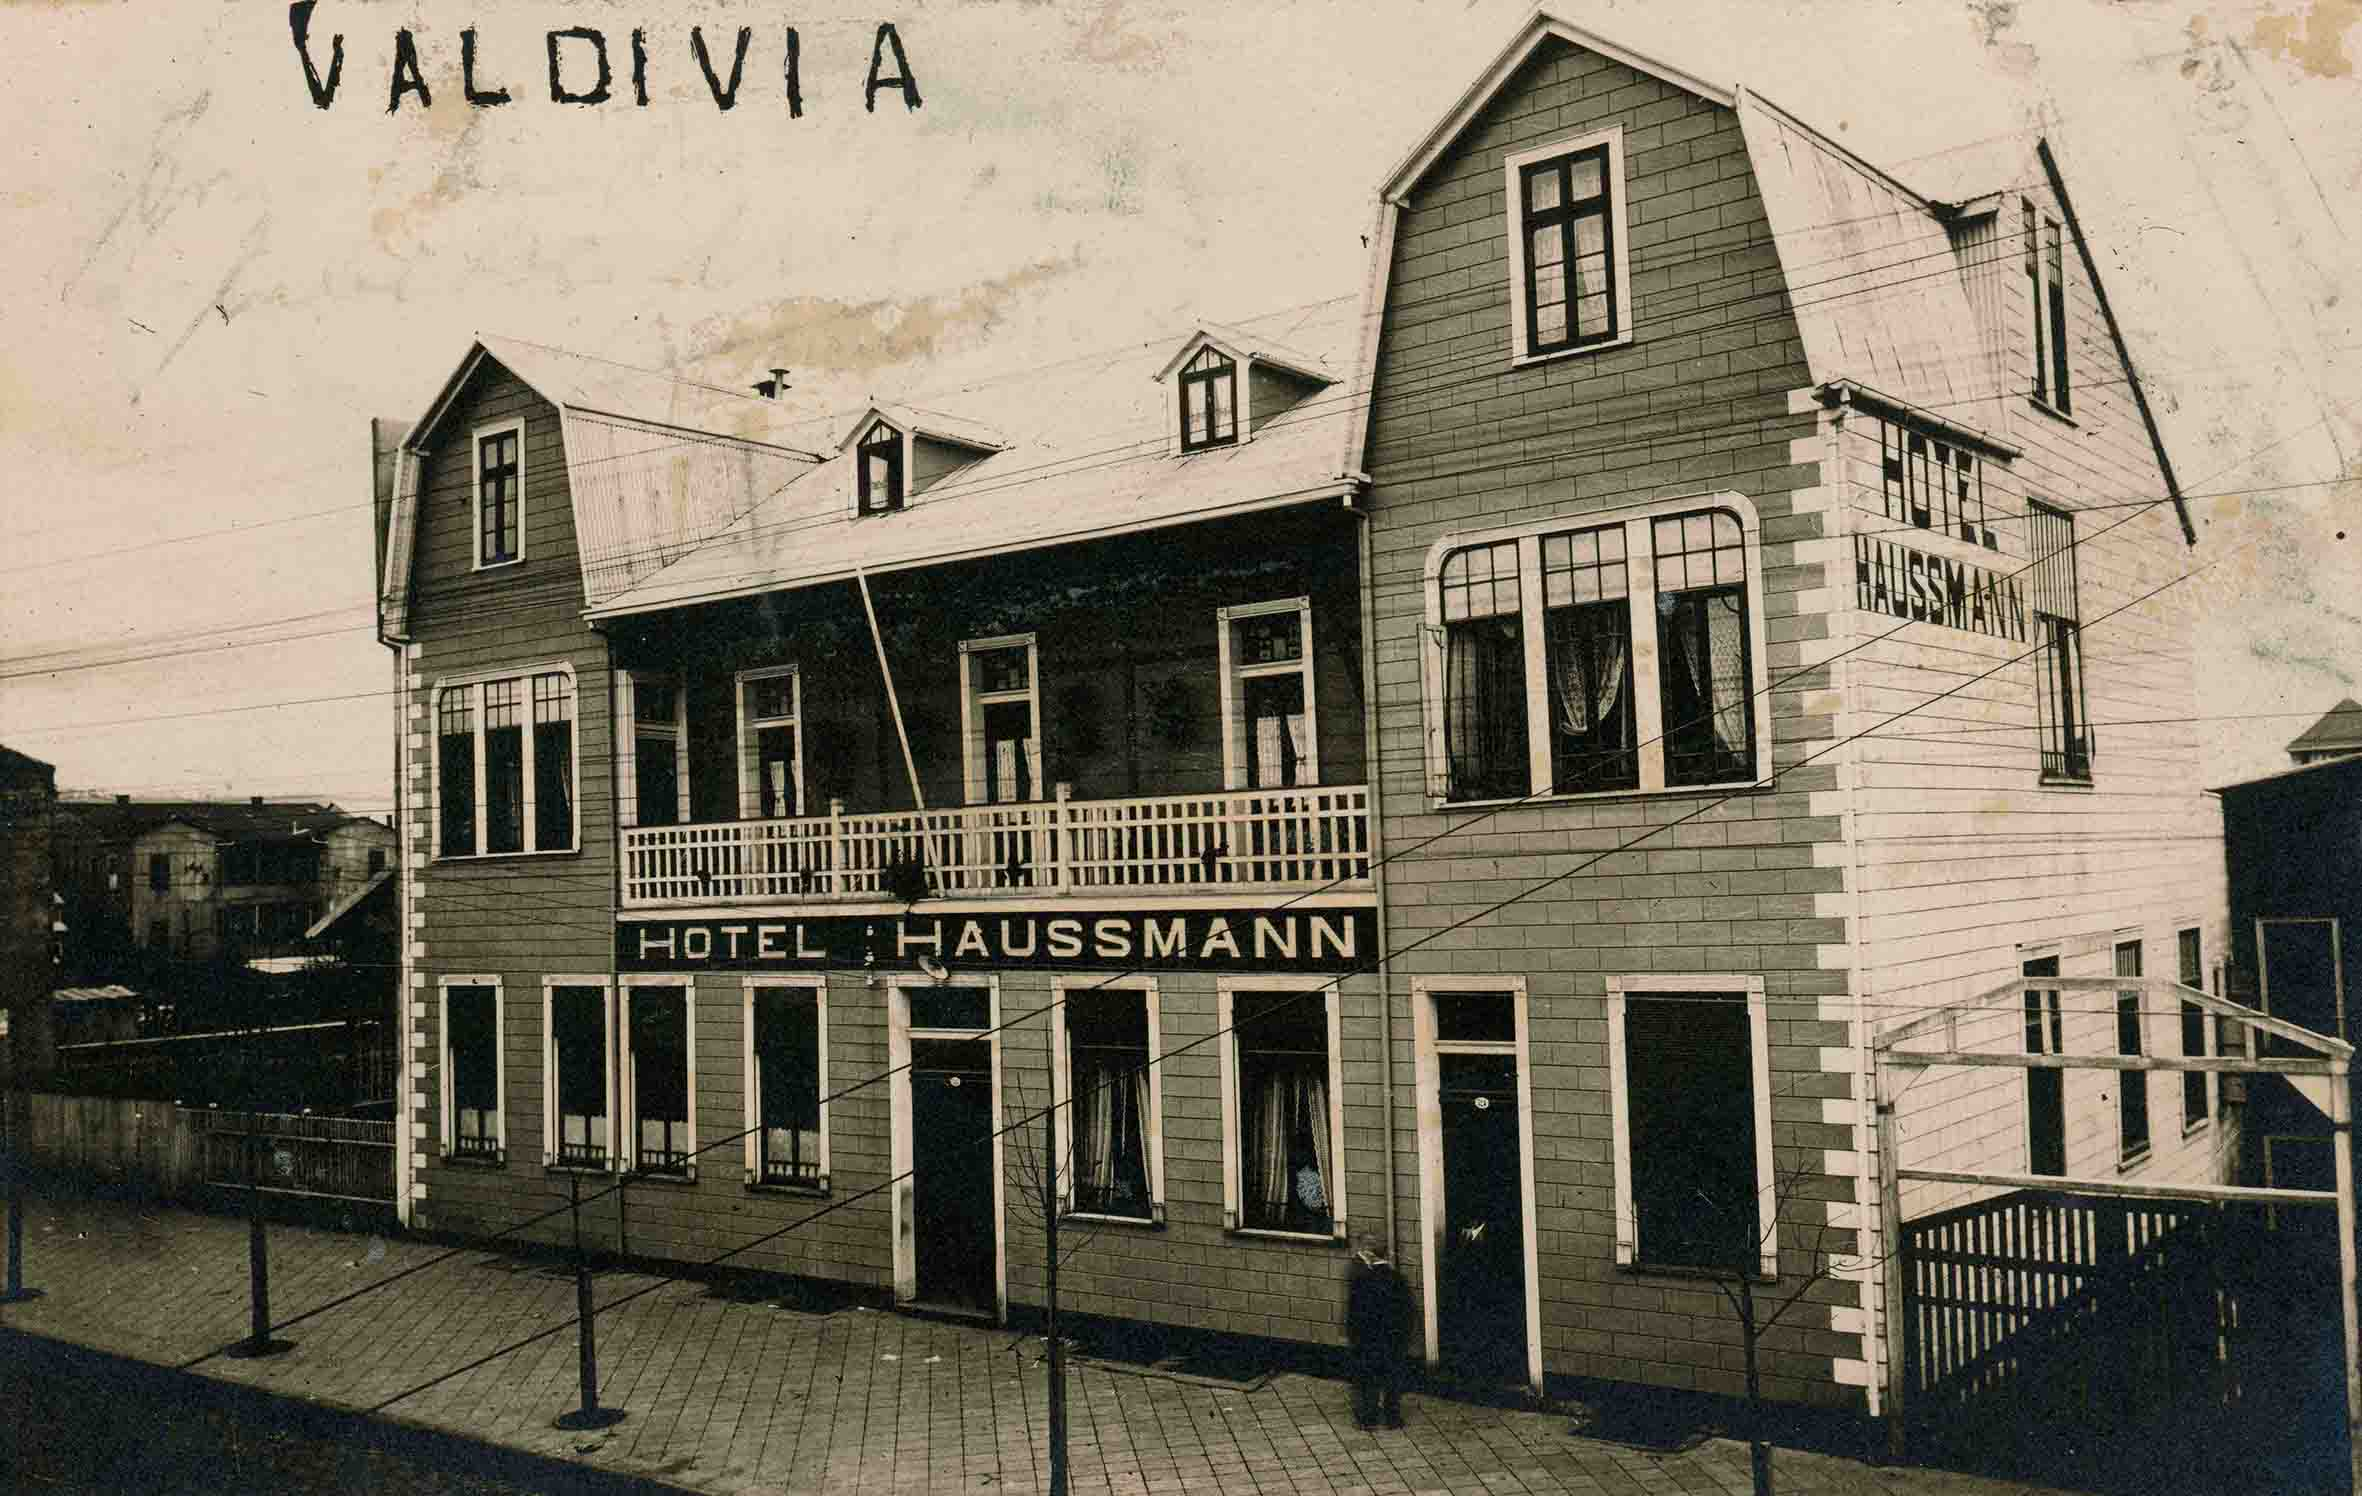 Enterreno - Fotos históricas de chile - fotos antiguas de Chile - Hotel Haussmann de Valdivia ca. 1930